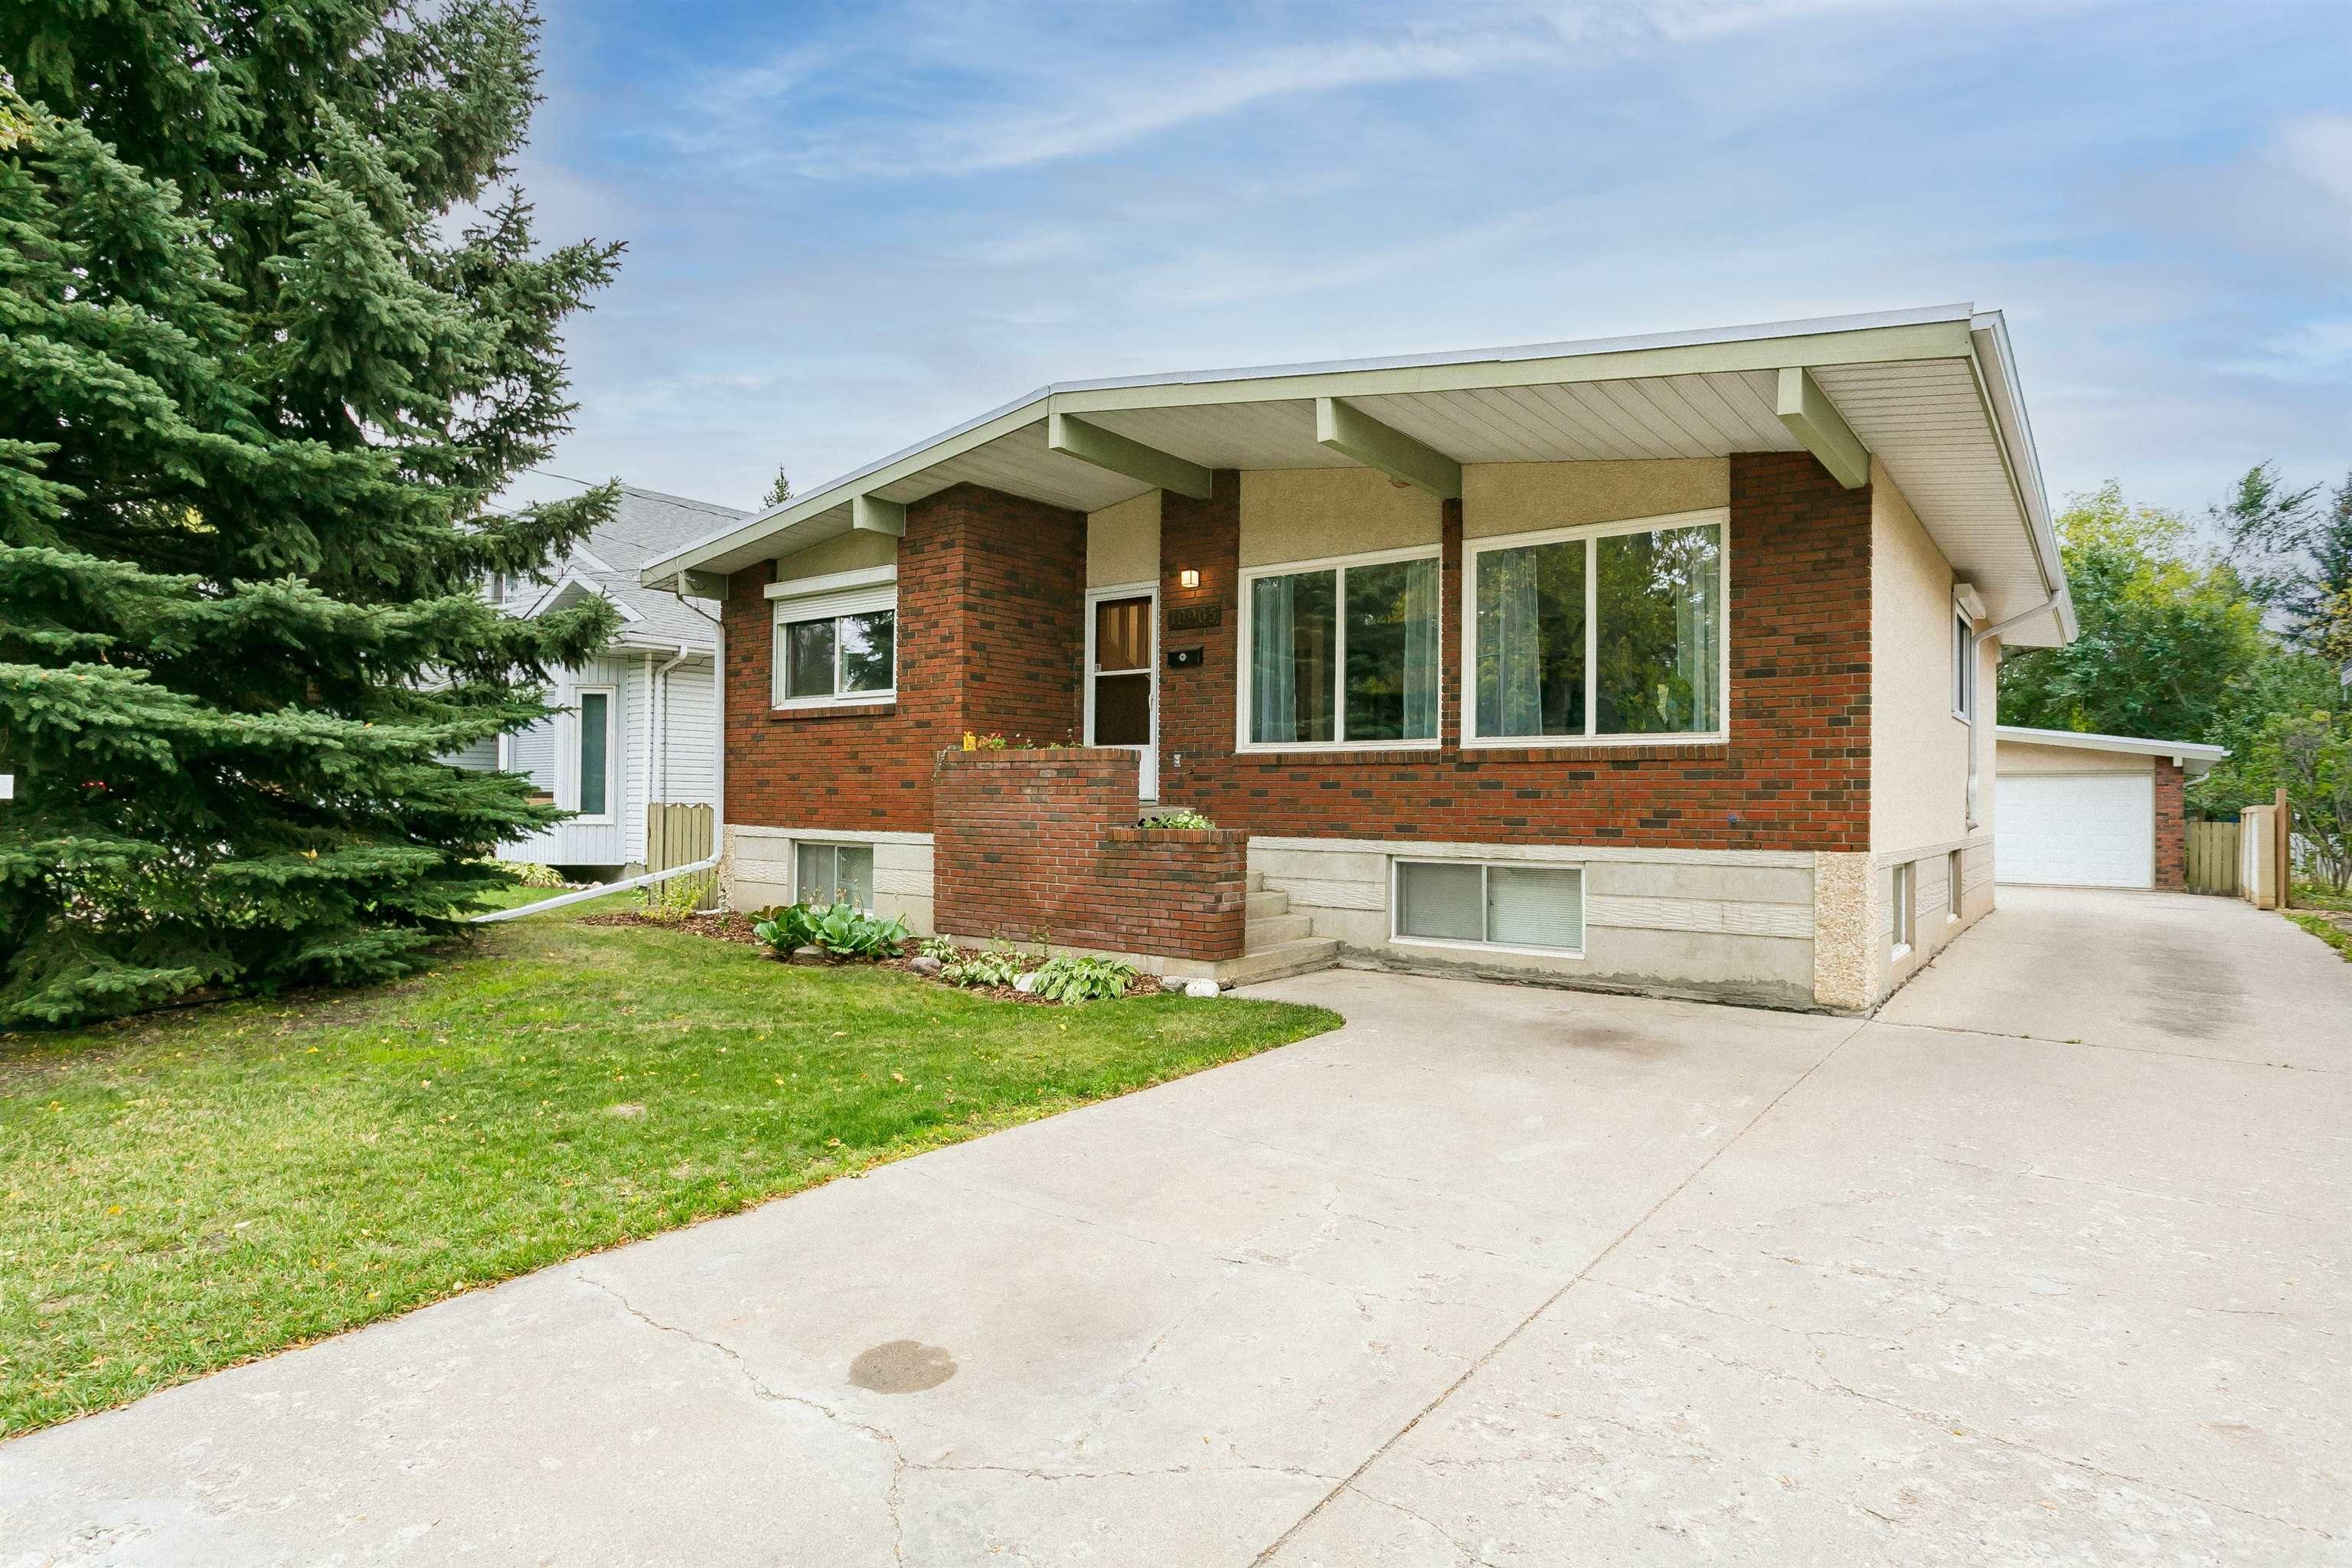 Main Photo: 10905 57 Avenue in Edmonton: Zone 15 House for sale : MLS®# E4263386